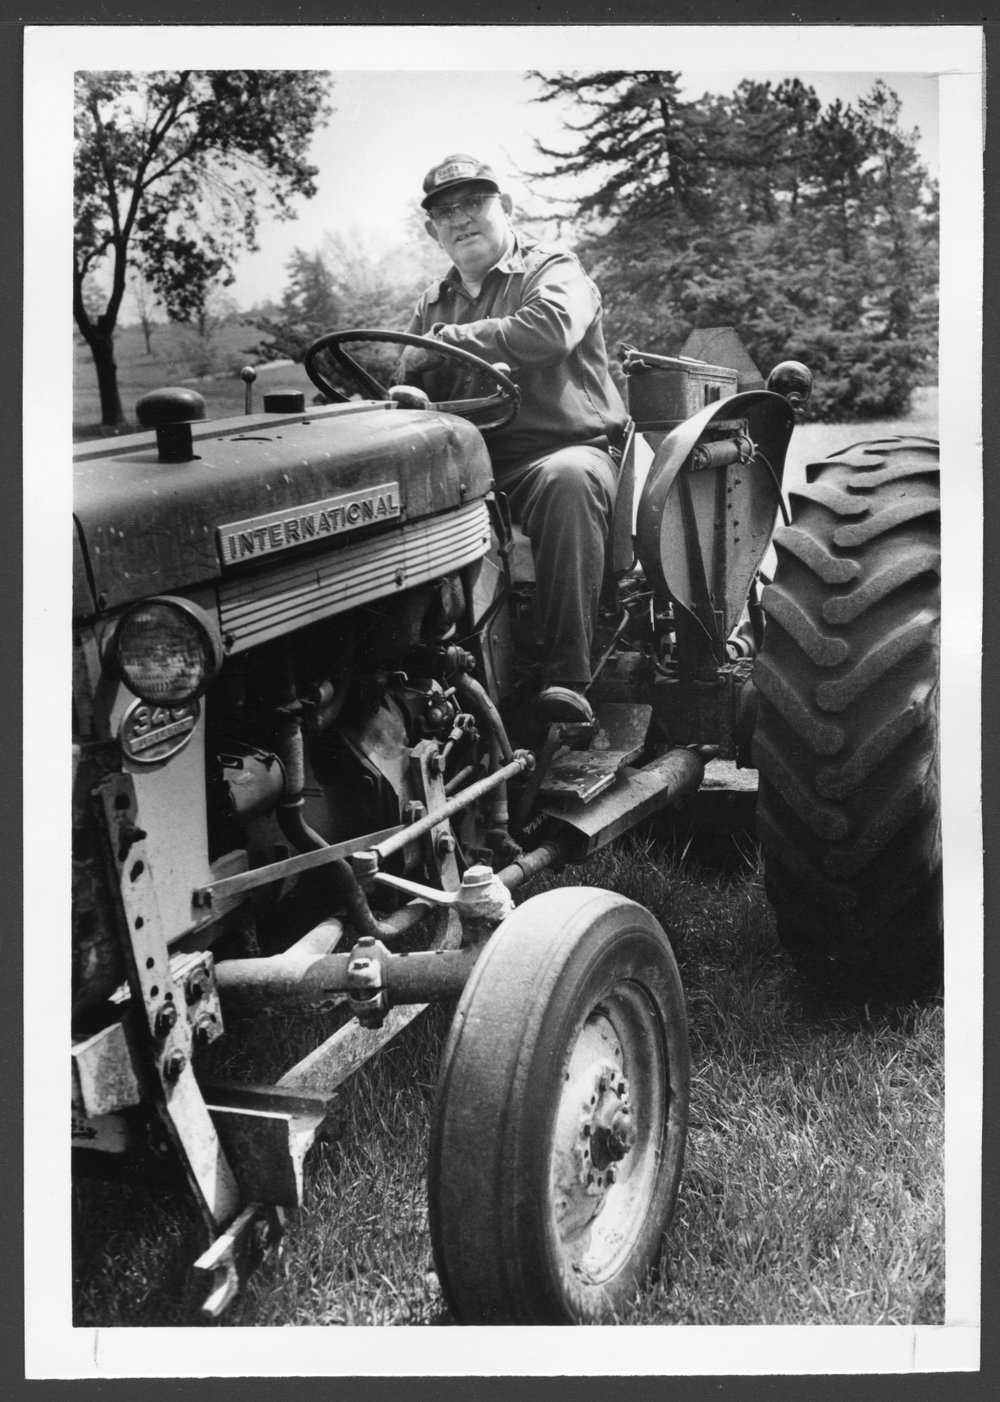 Plant Operations staff at Menninger Clinic, Topeka, Kansas - Ray McMillan on the International tractor.